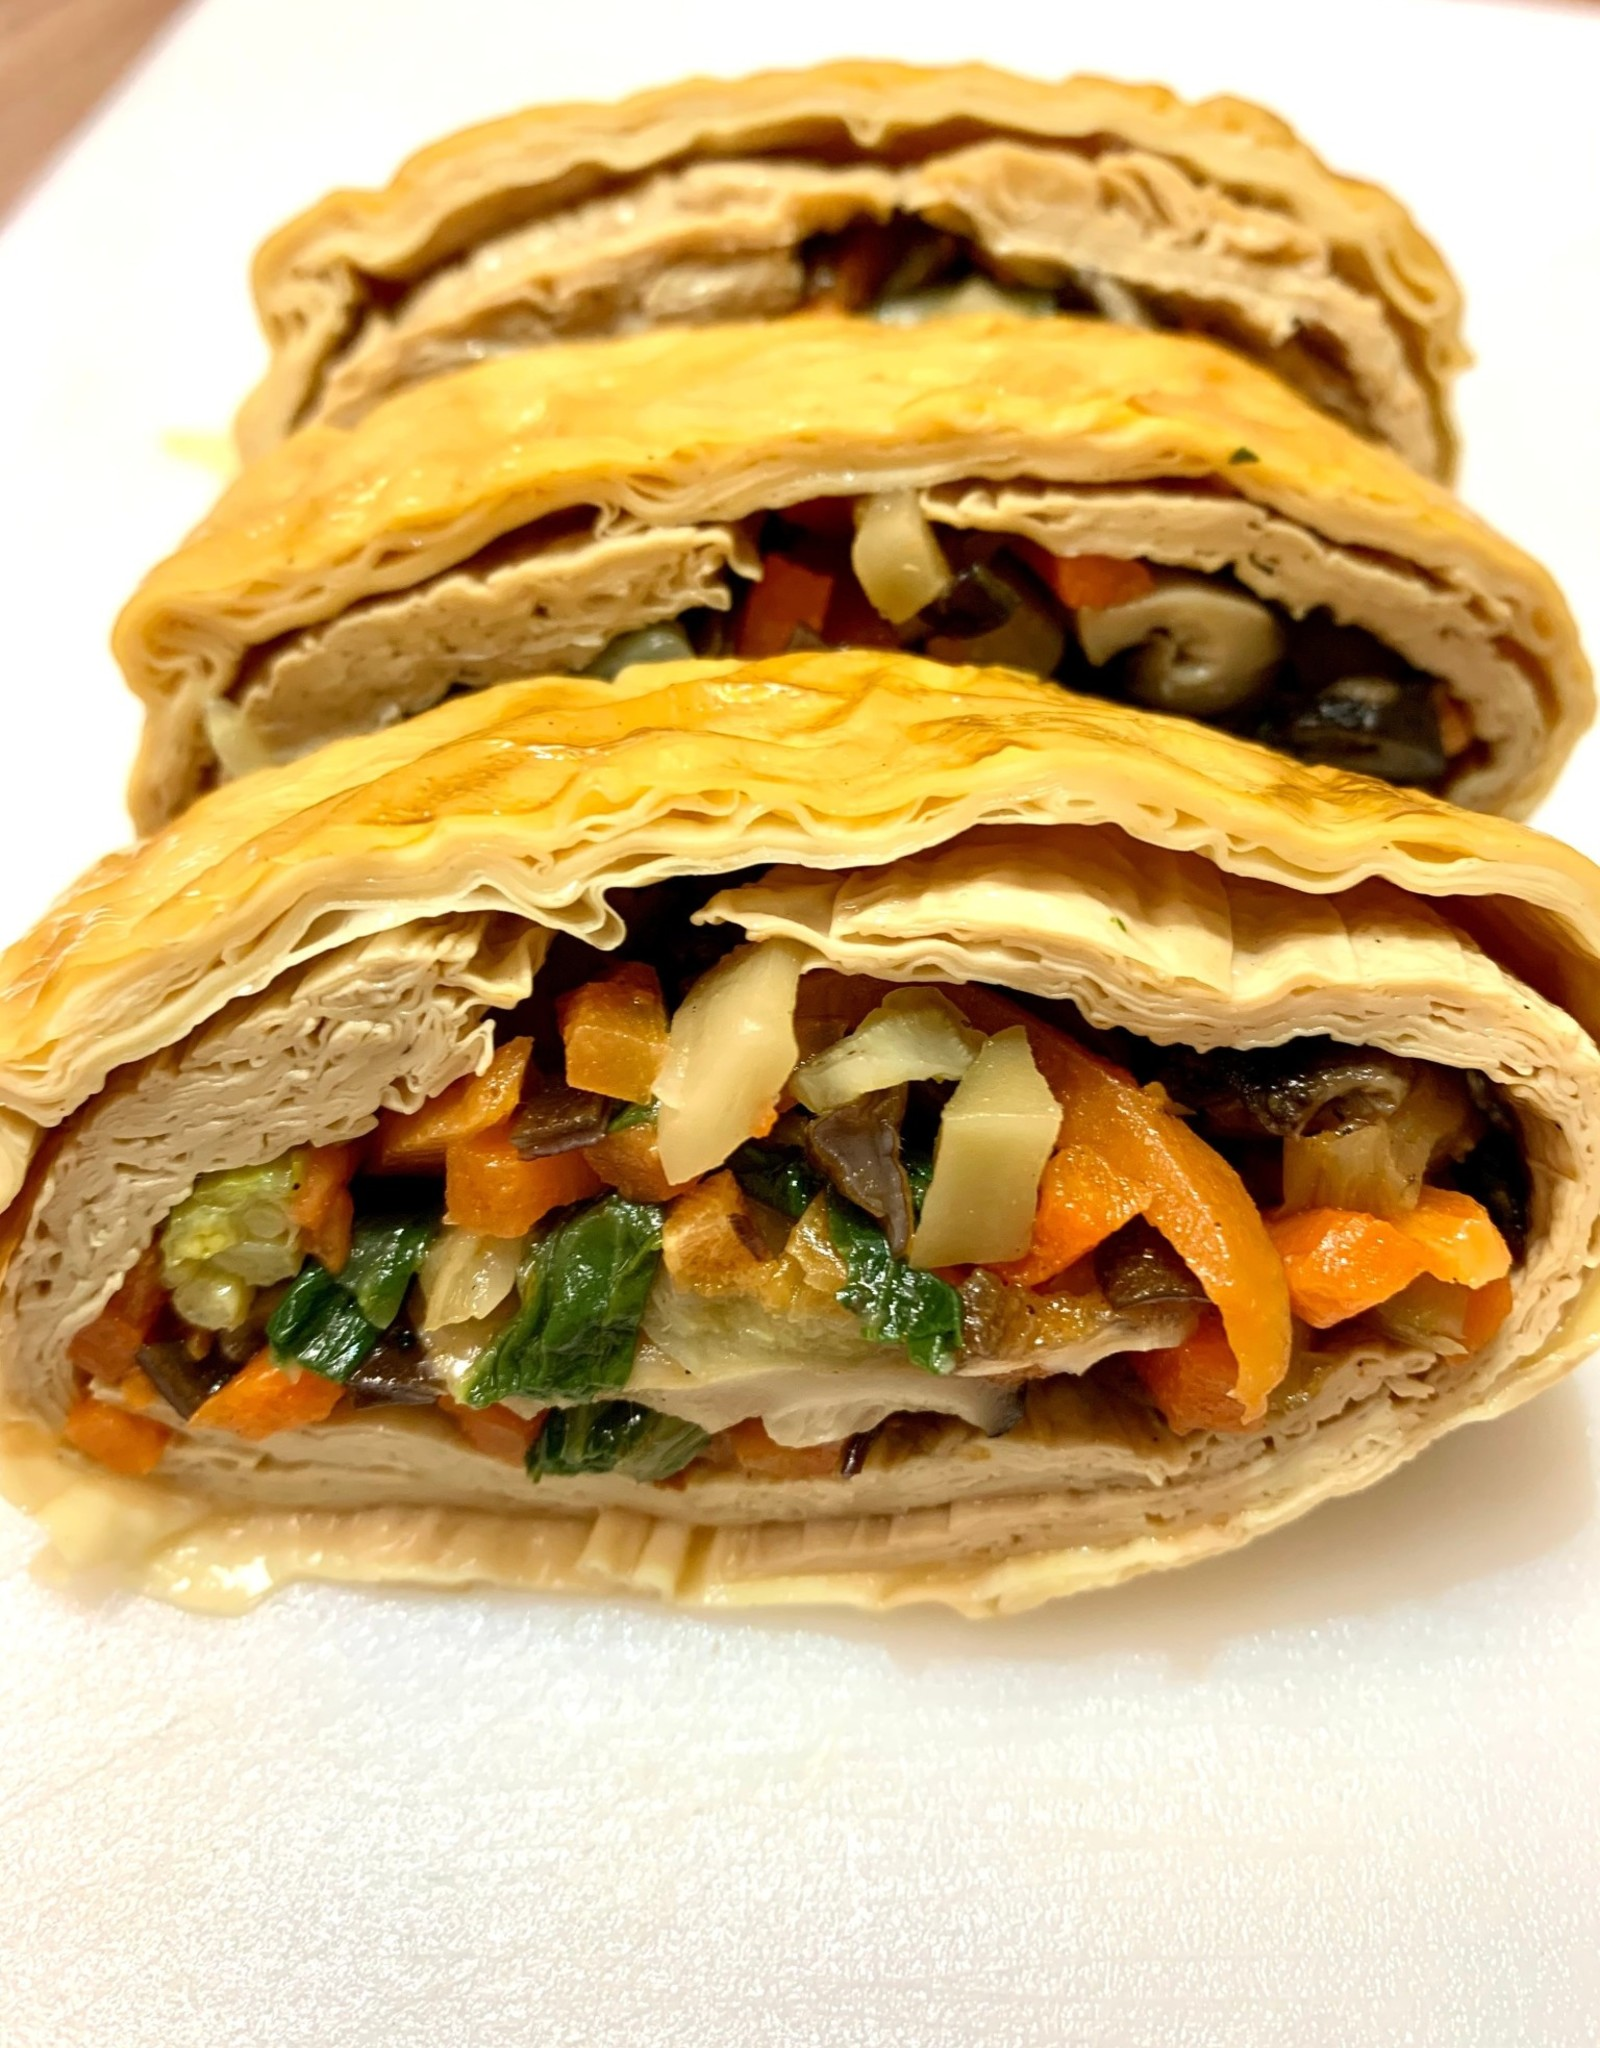 Hung Kitchen*鴻廚 (HK) Vegan Bean Curd Roll *(鴻廚) 手工素鵝